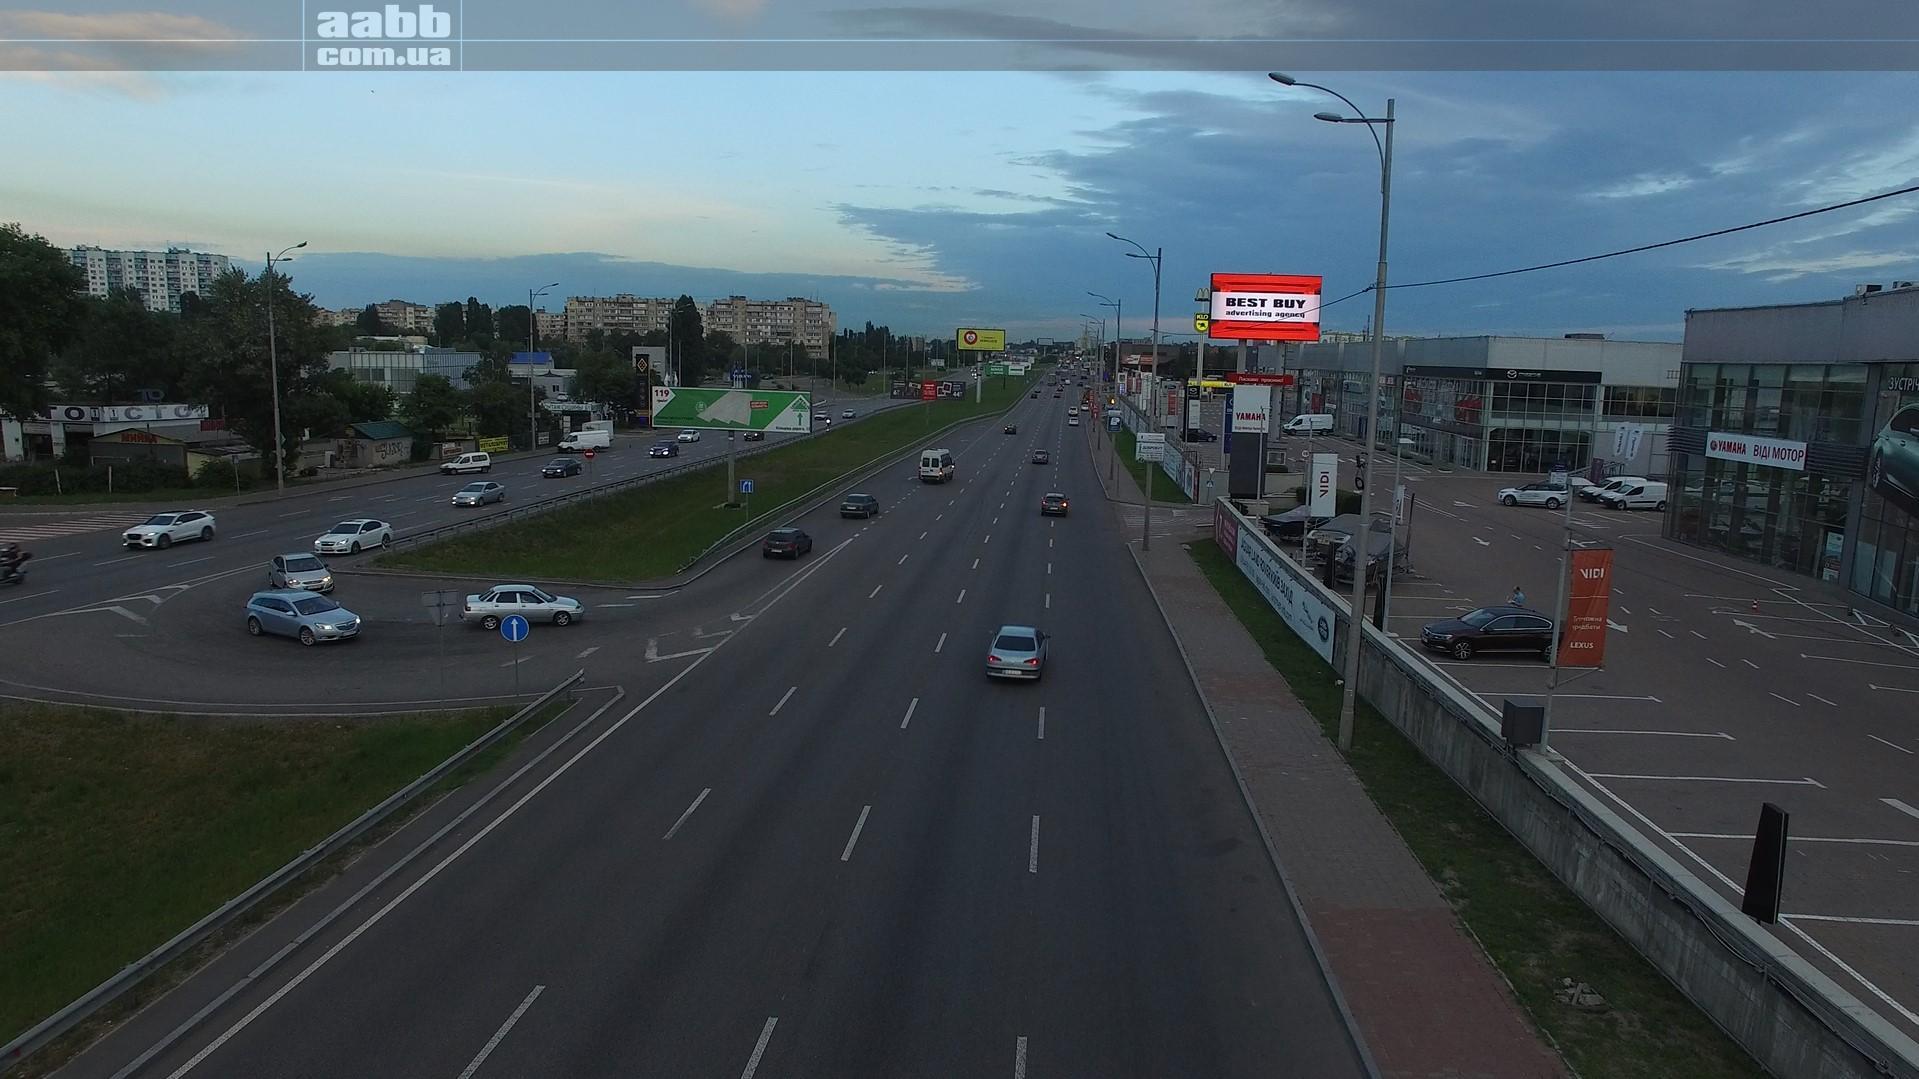 Реклама на відеоборді на вул. Окружна в м. Київ